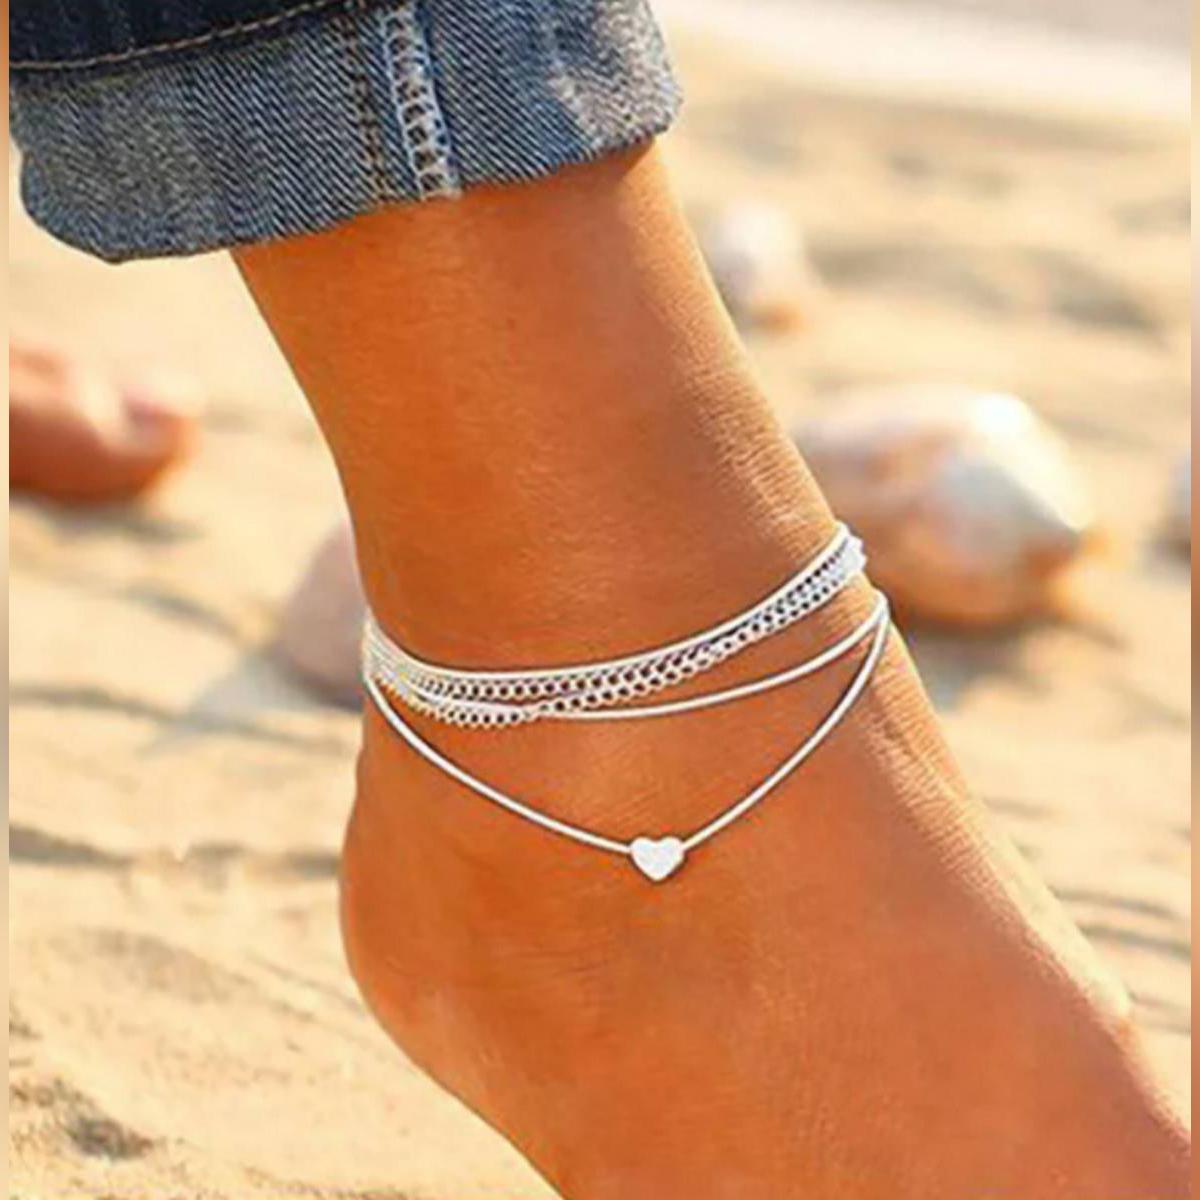 New Fashion Heart Anklet Bracelet Silver Chain Romantic Adjustable Anklet for girls